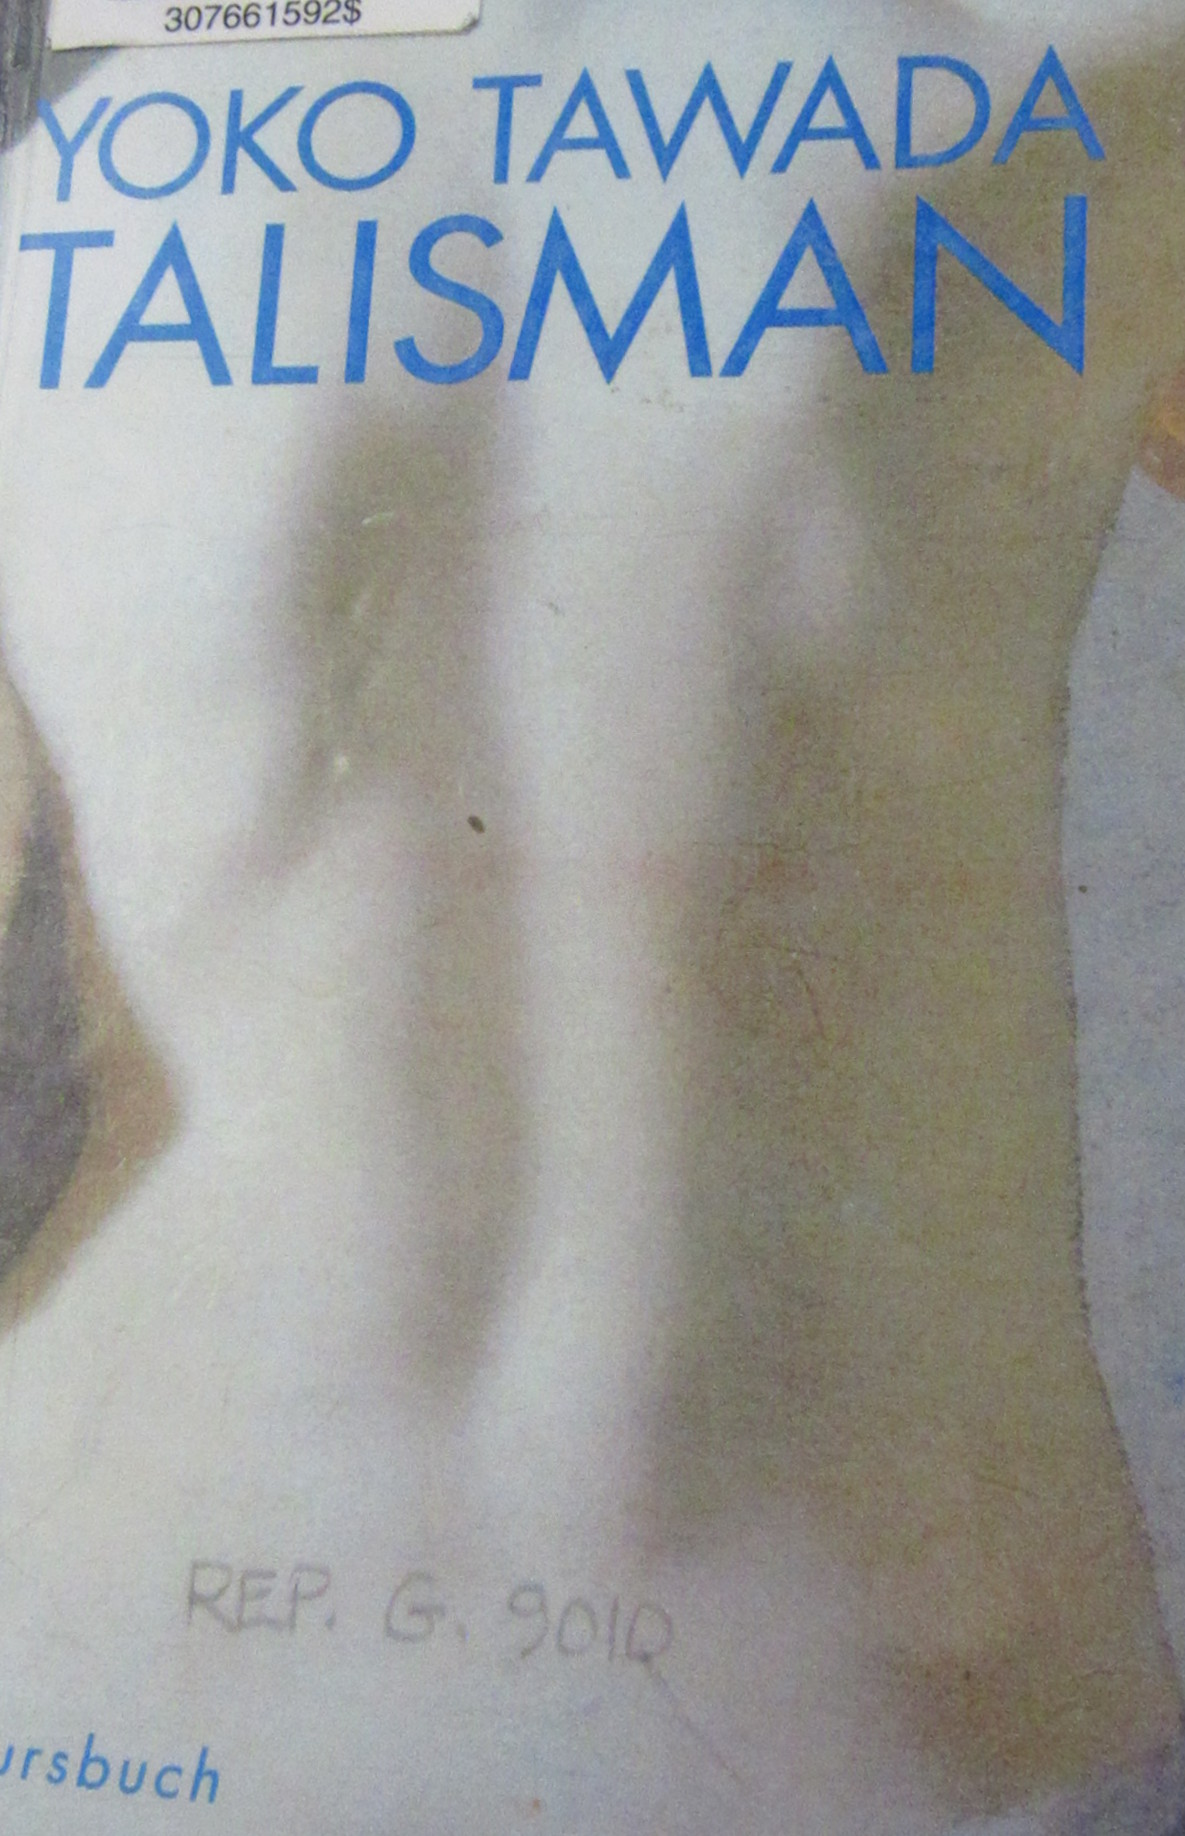 Tawada, Yōko, and Peter. Pörtner. Talisman. Tübingen: Konkursbuch, 1996.